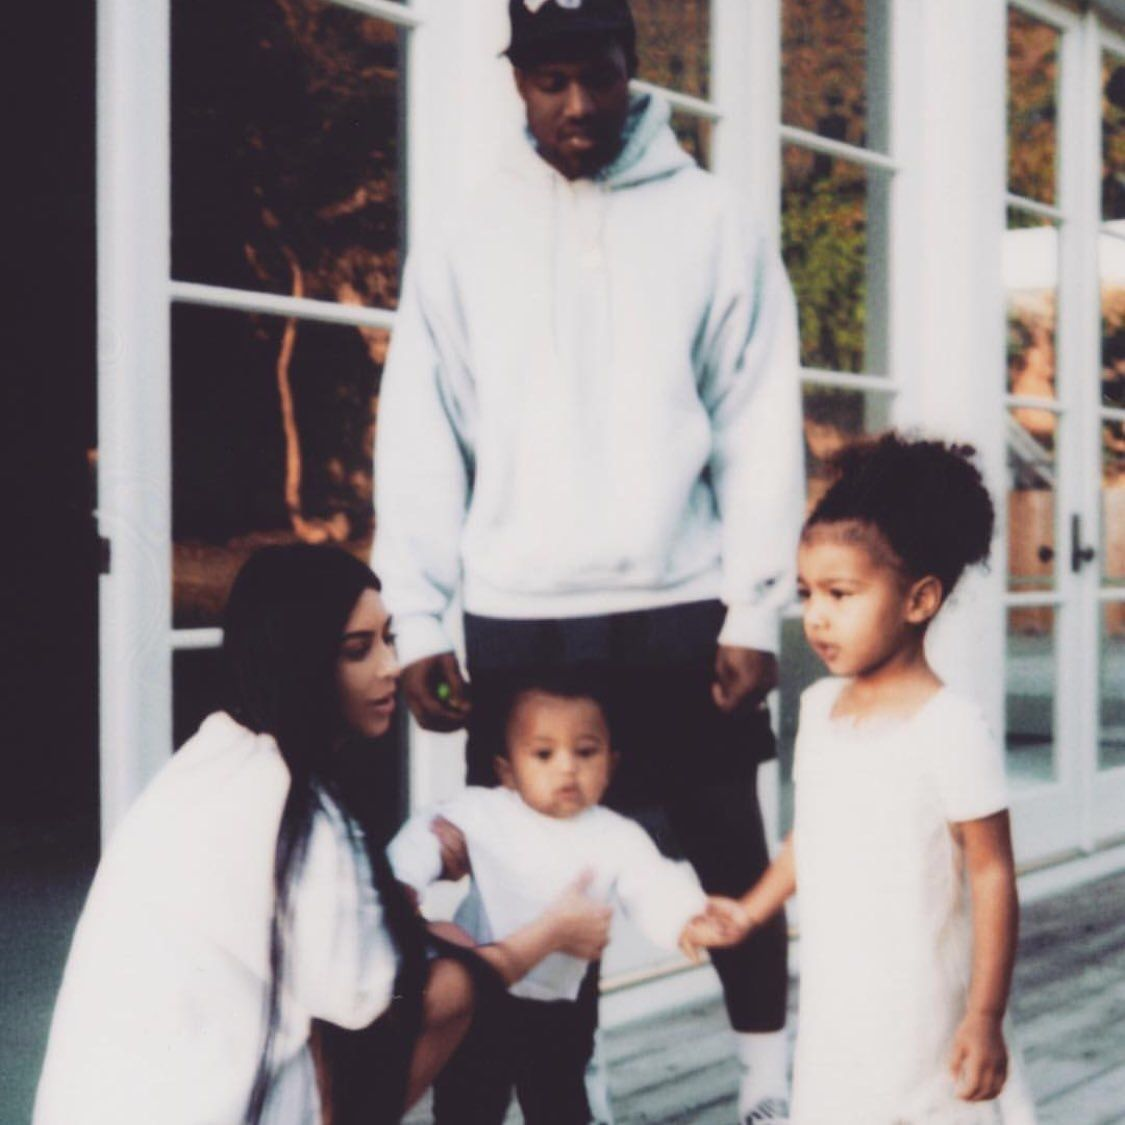 Kim Kardashian back on Instagram after Hiatus ❤ #kimkardashian #instagram #kardashian #vibes #yeezy